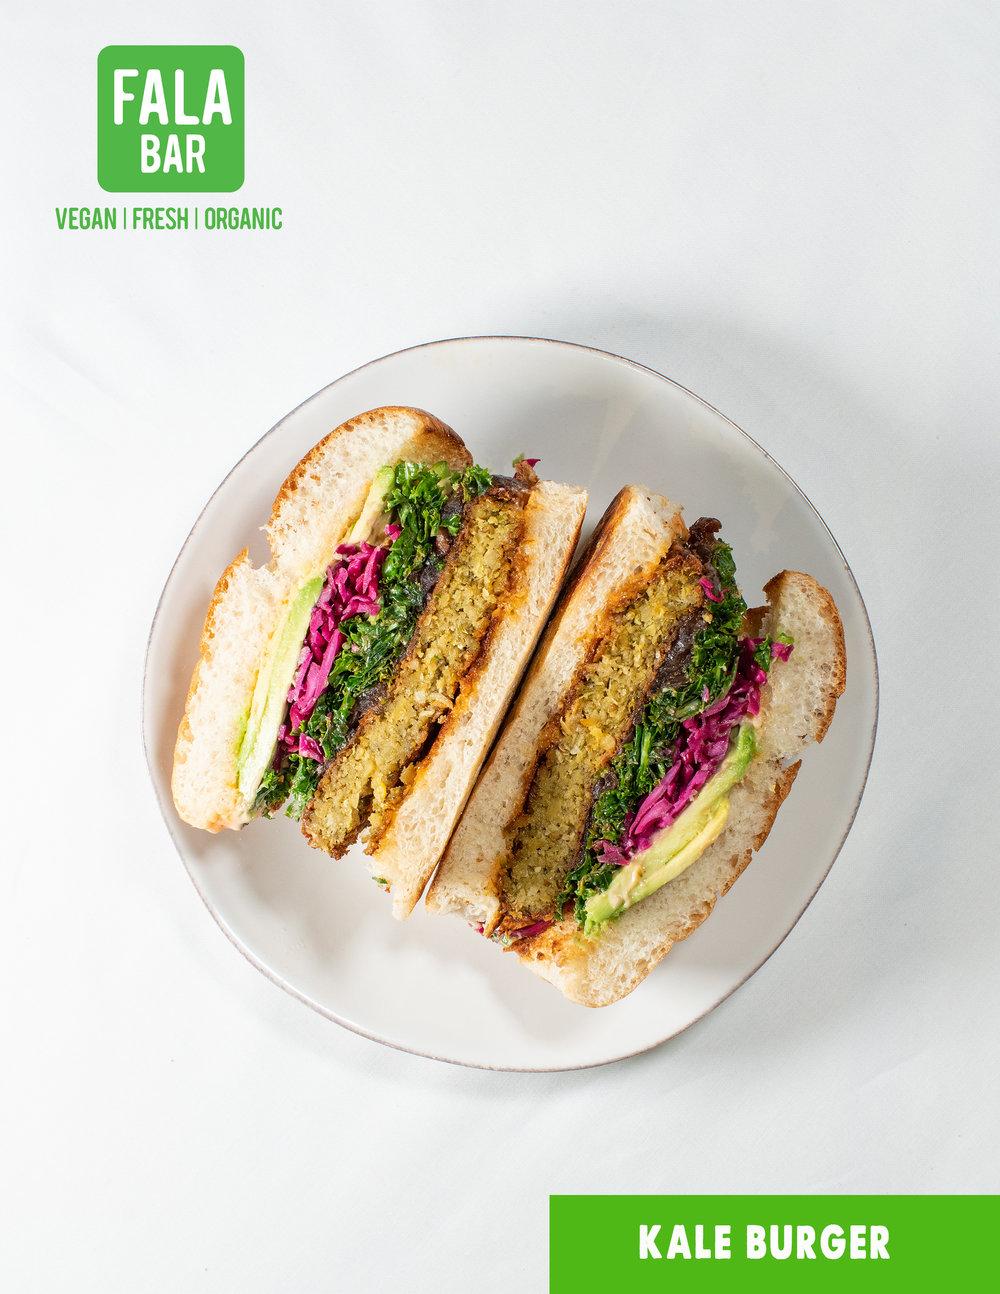 Kale Burger